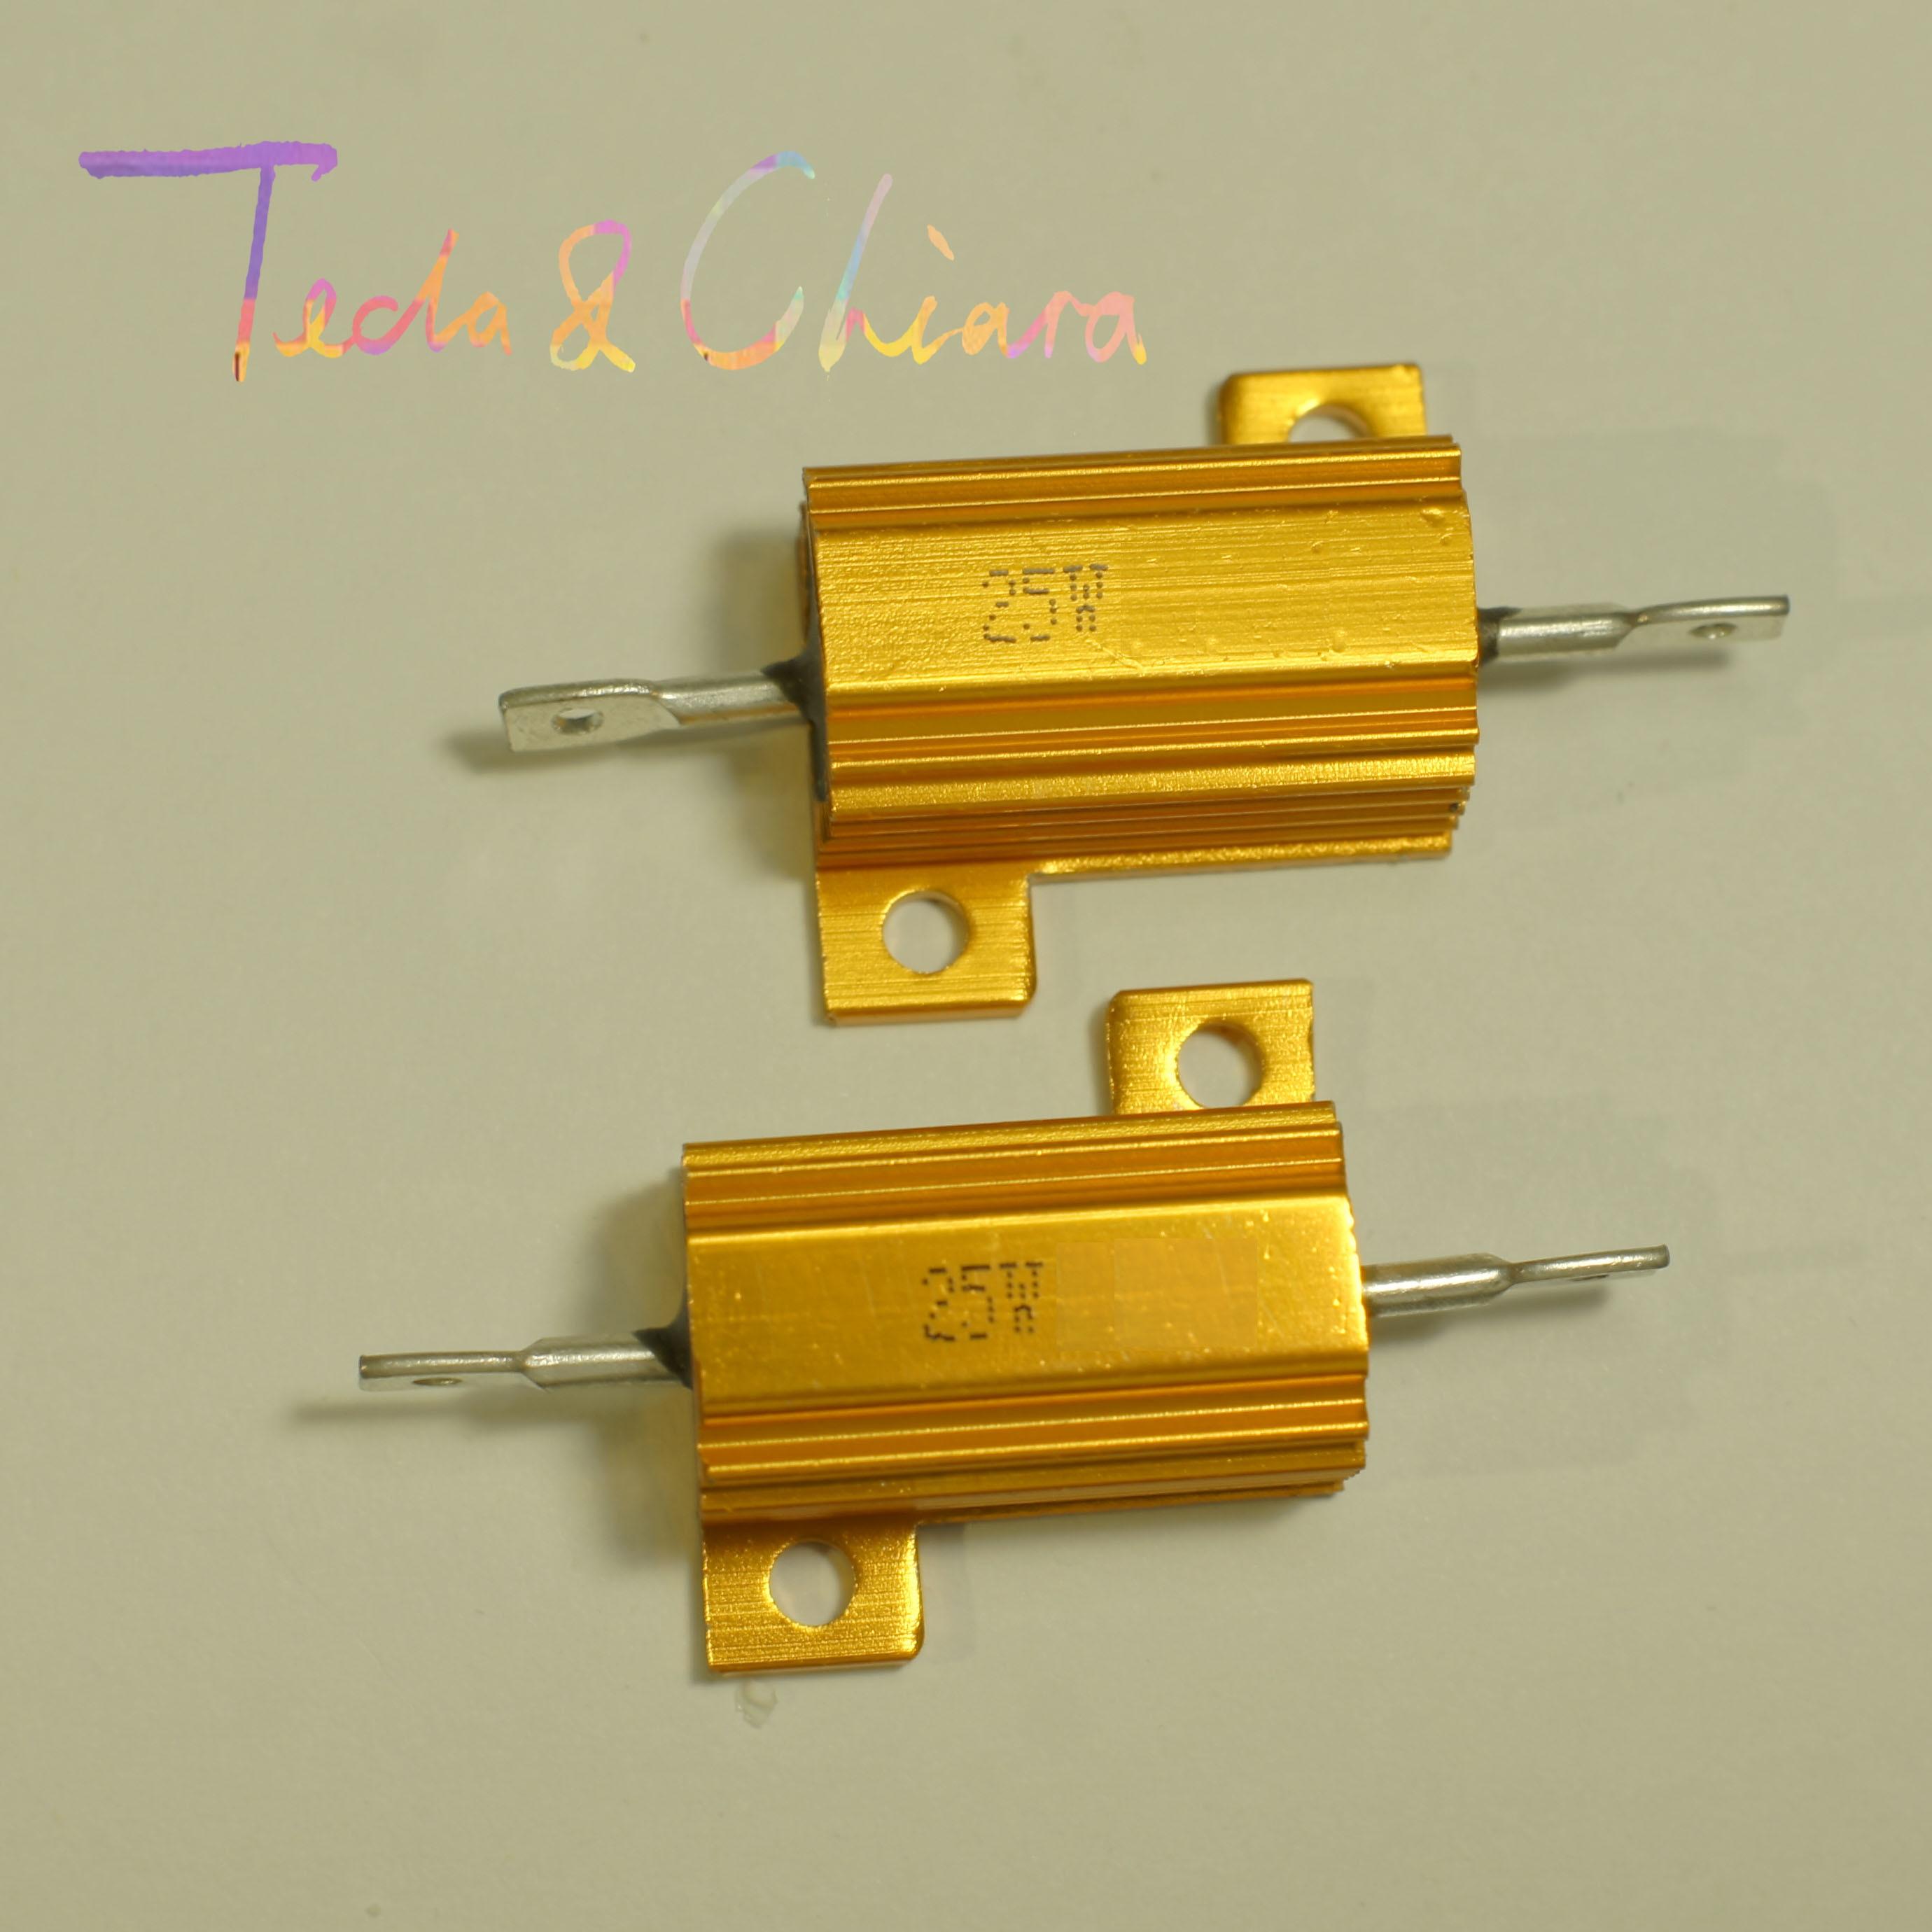 100R 100ohm 100 10R 10ohm 10 R Ohm 25W Watt Wirewound Aluminum Power Metal Shell Case Resistance Resistor RX24 wirewound ceramic potentiometer adjustable rheostat resistor 25w 1r 2r 5r 10r 20r 30r 50r 100r 150r 200r 300r 500r 1kr 2kr